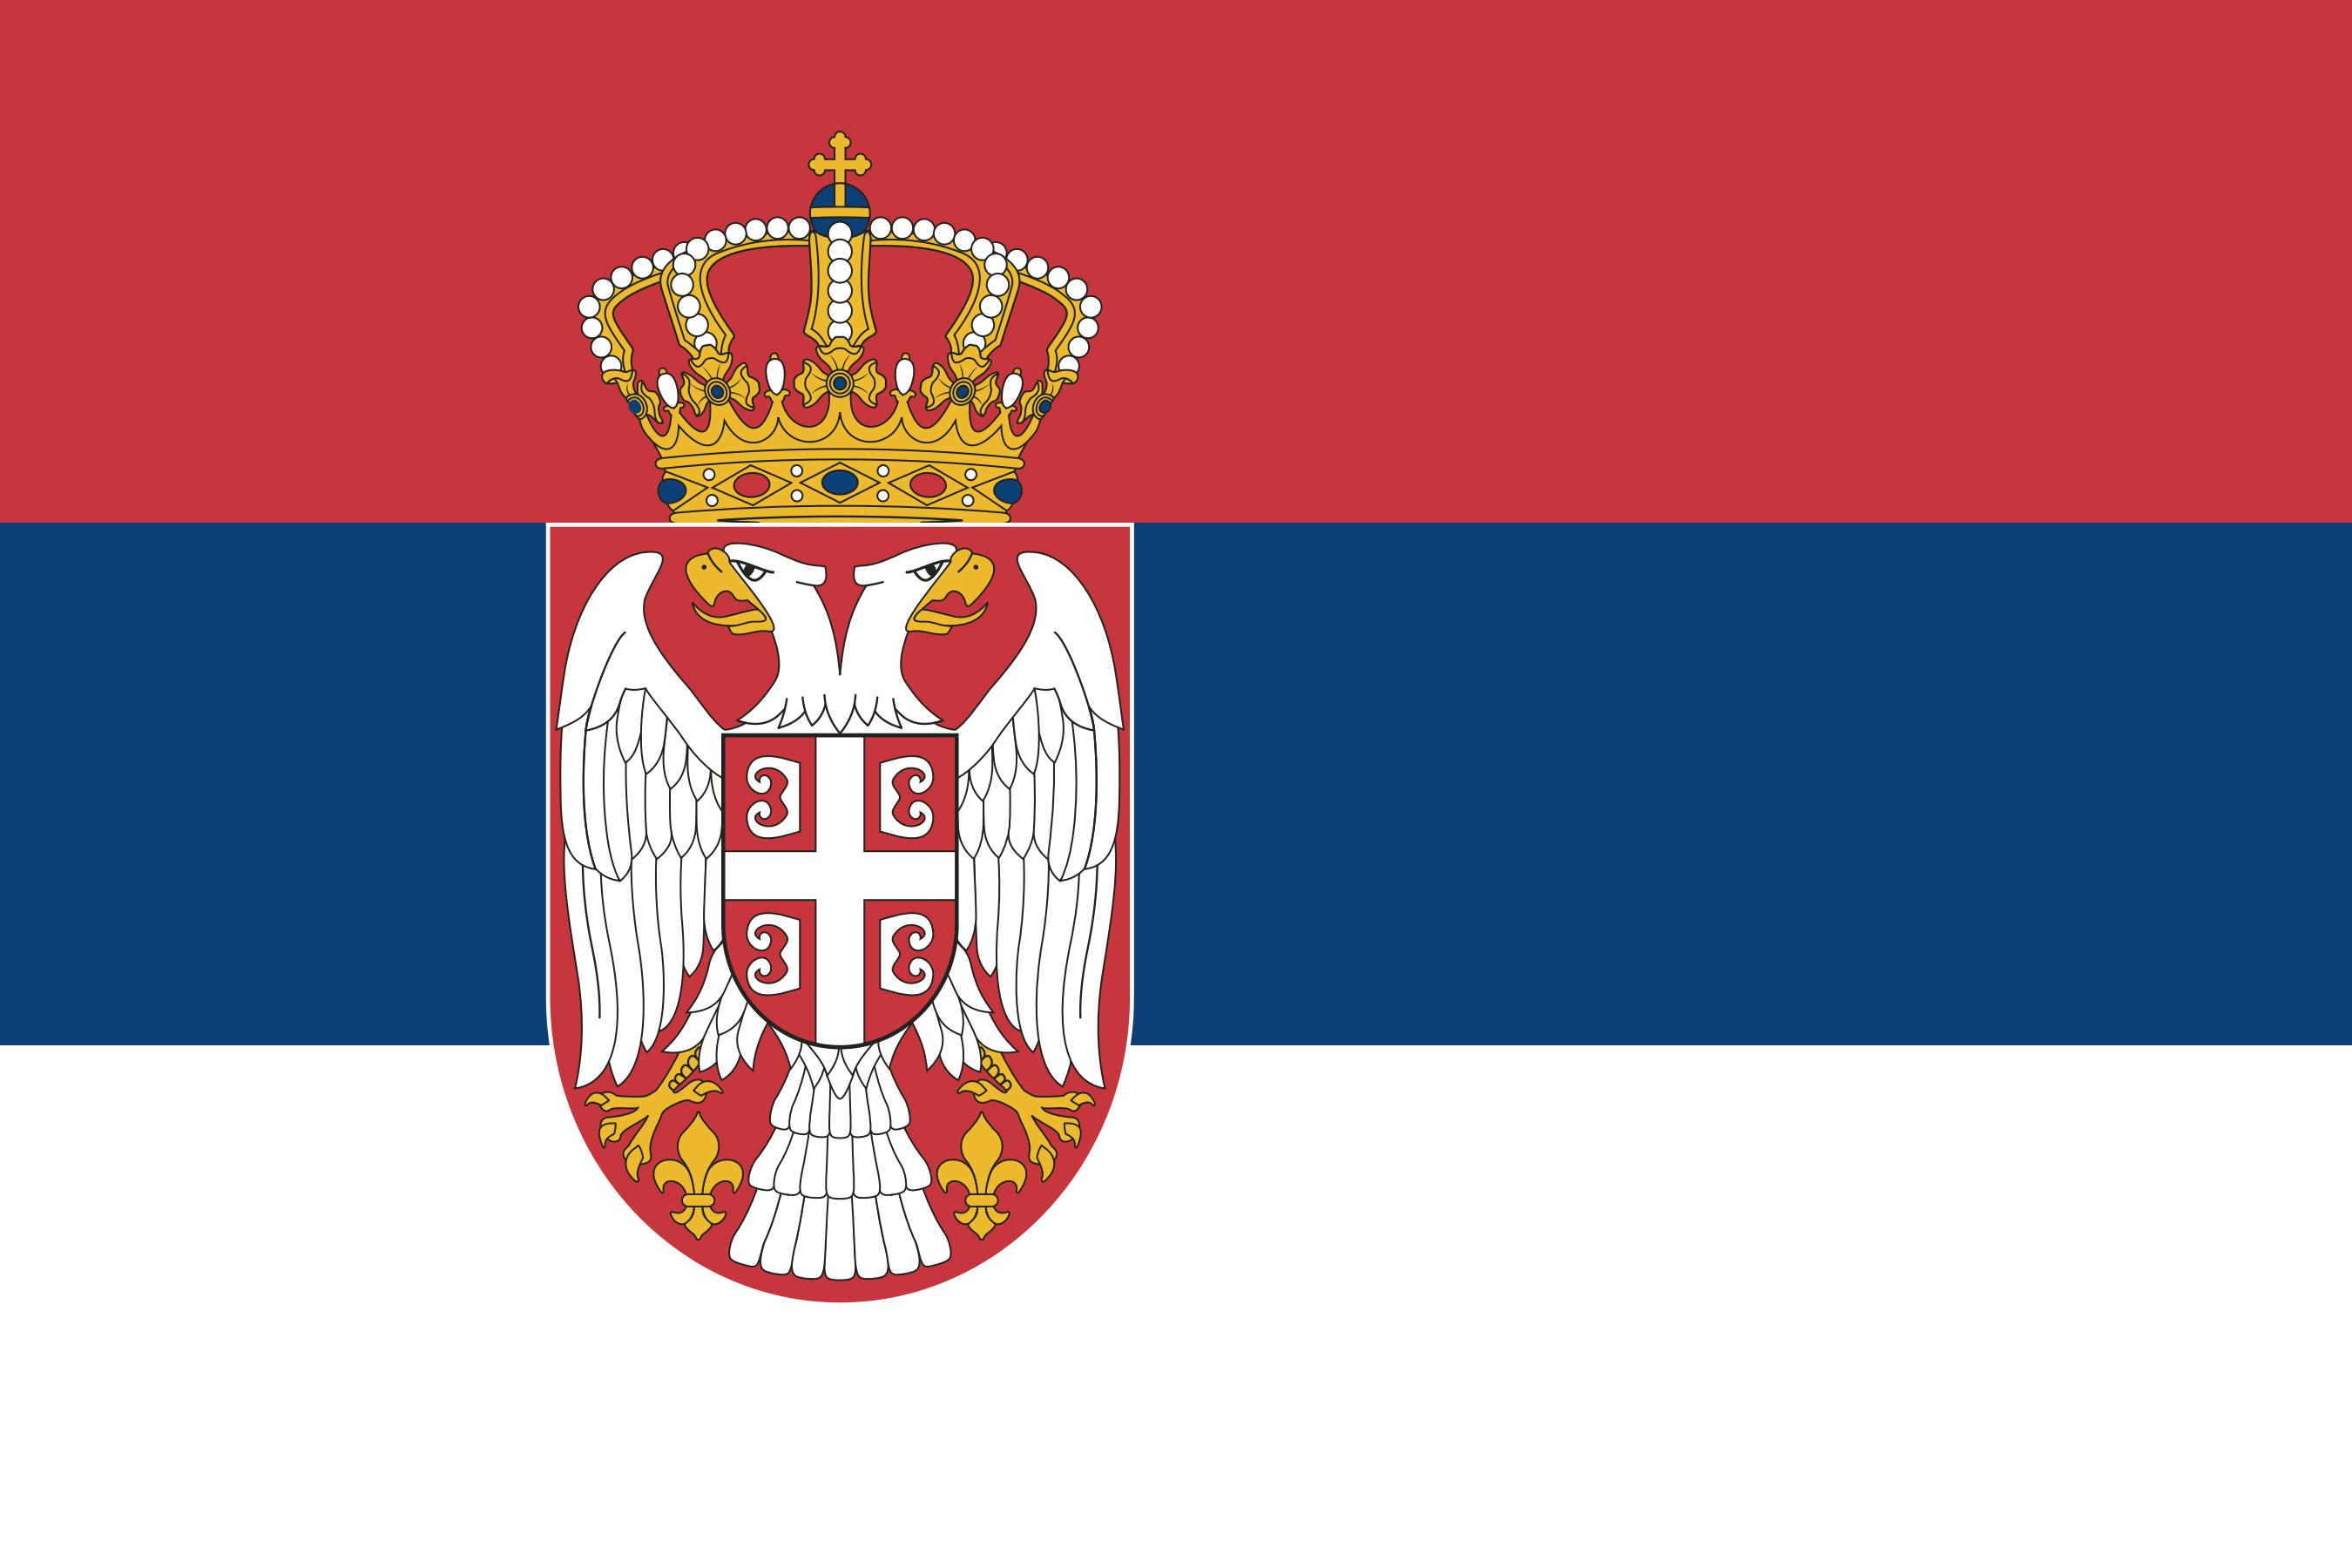 Zastava Srbije Vector EPS Free Download, Logo, Icons, Clipart.